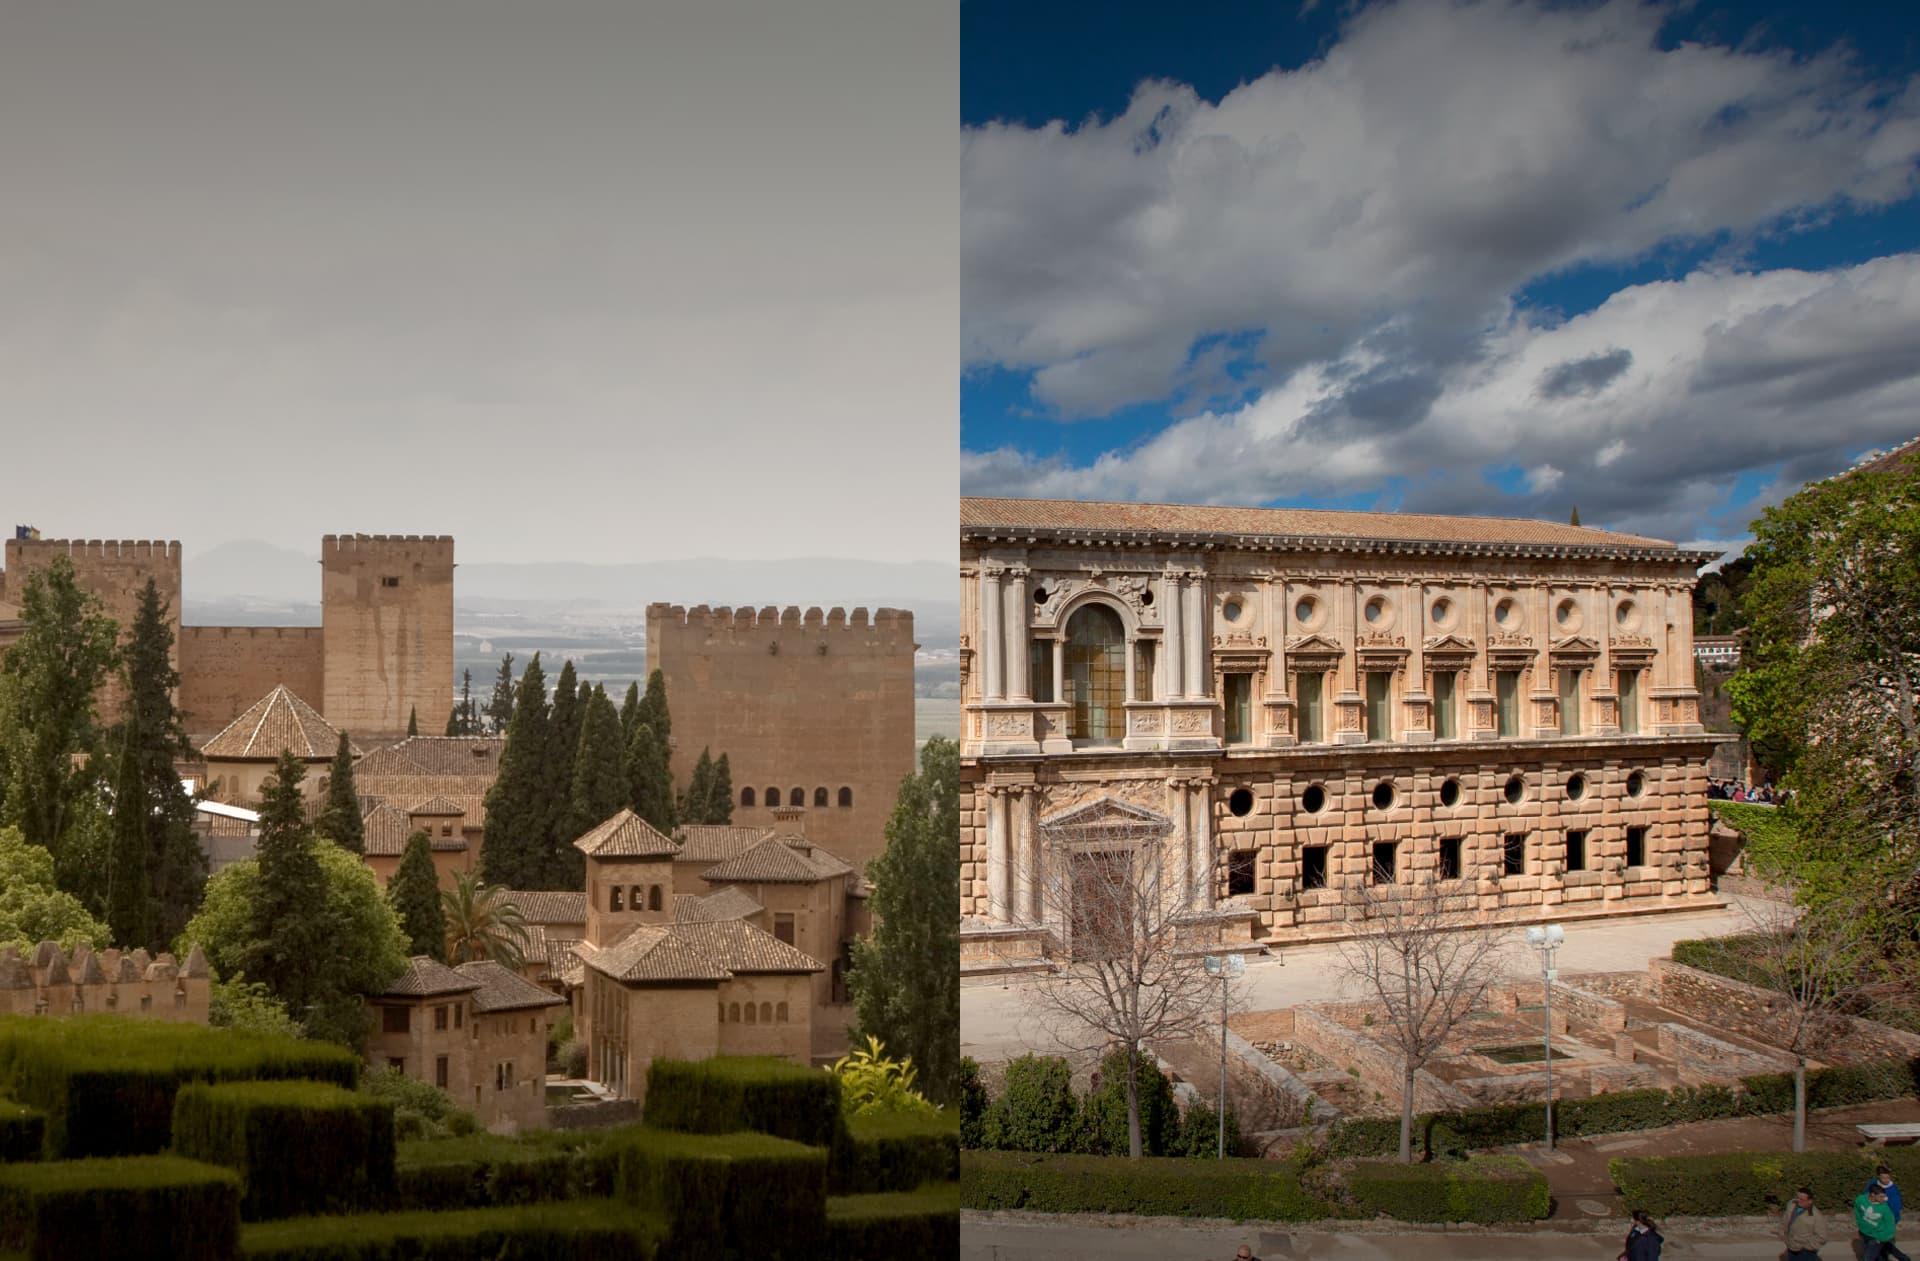 Paisaje de la Alhambra